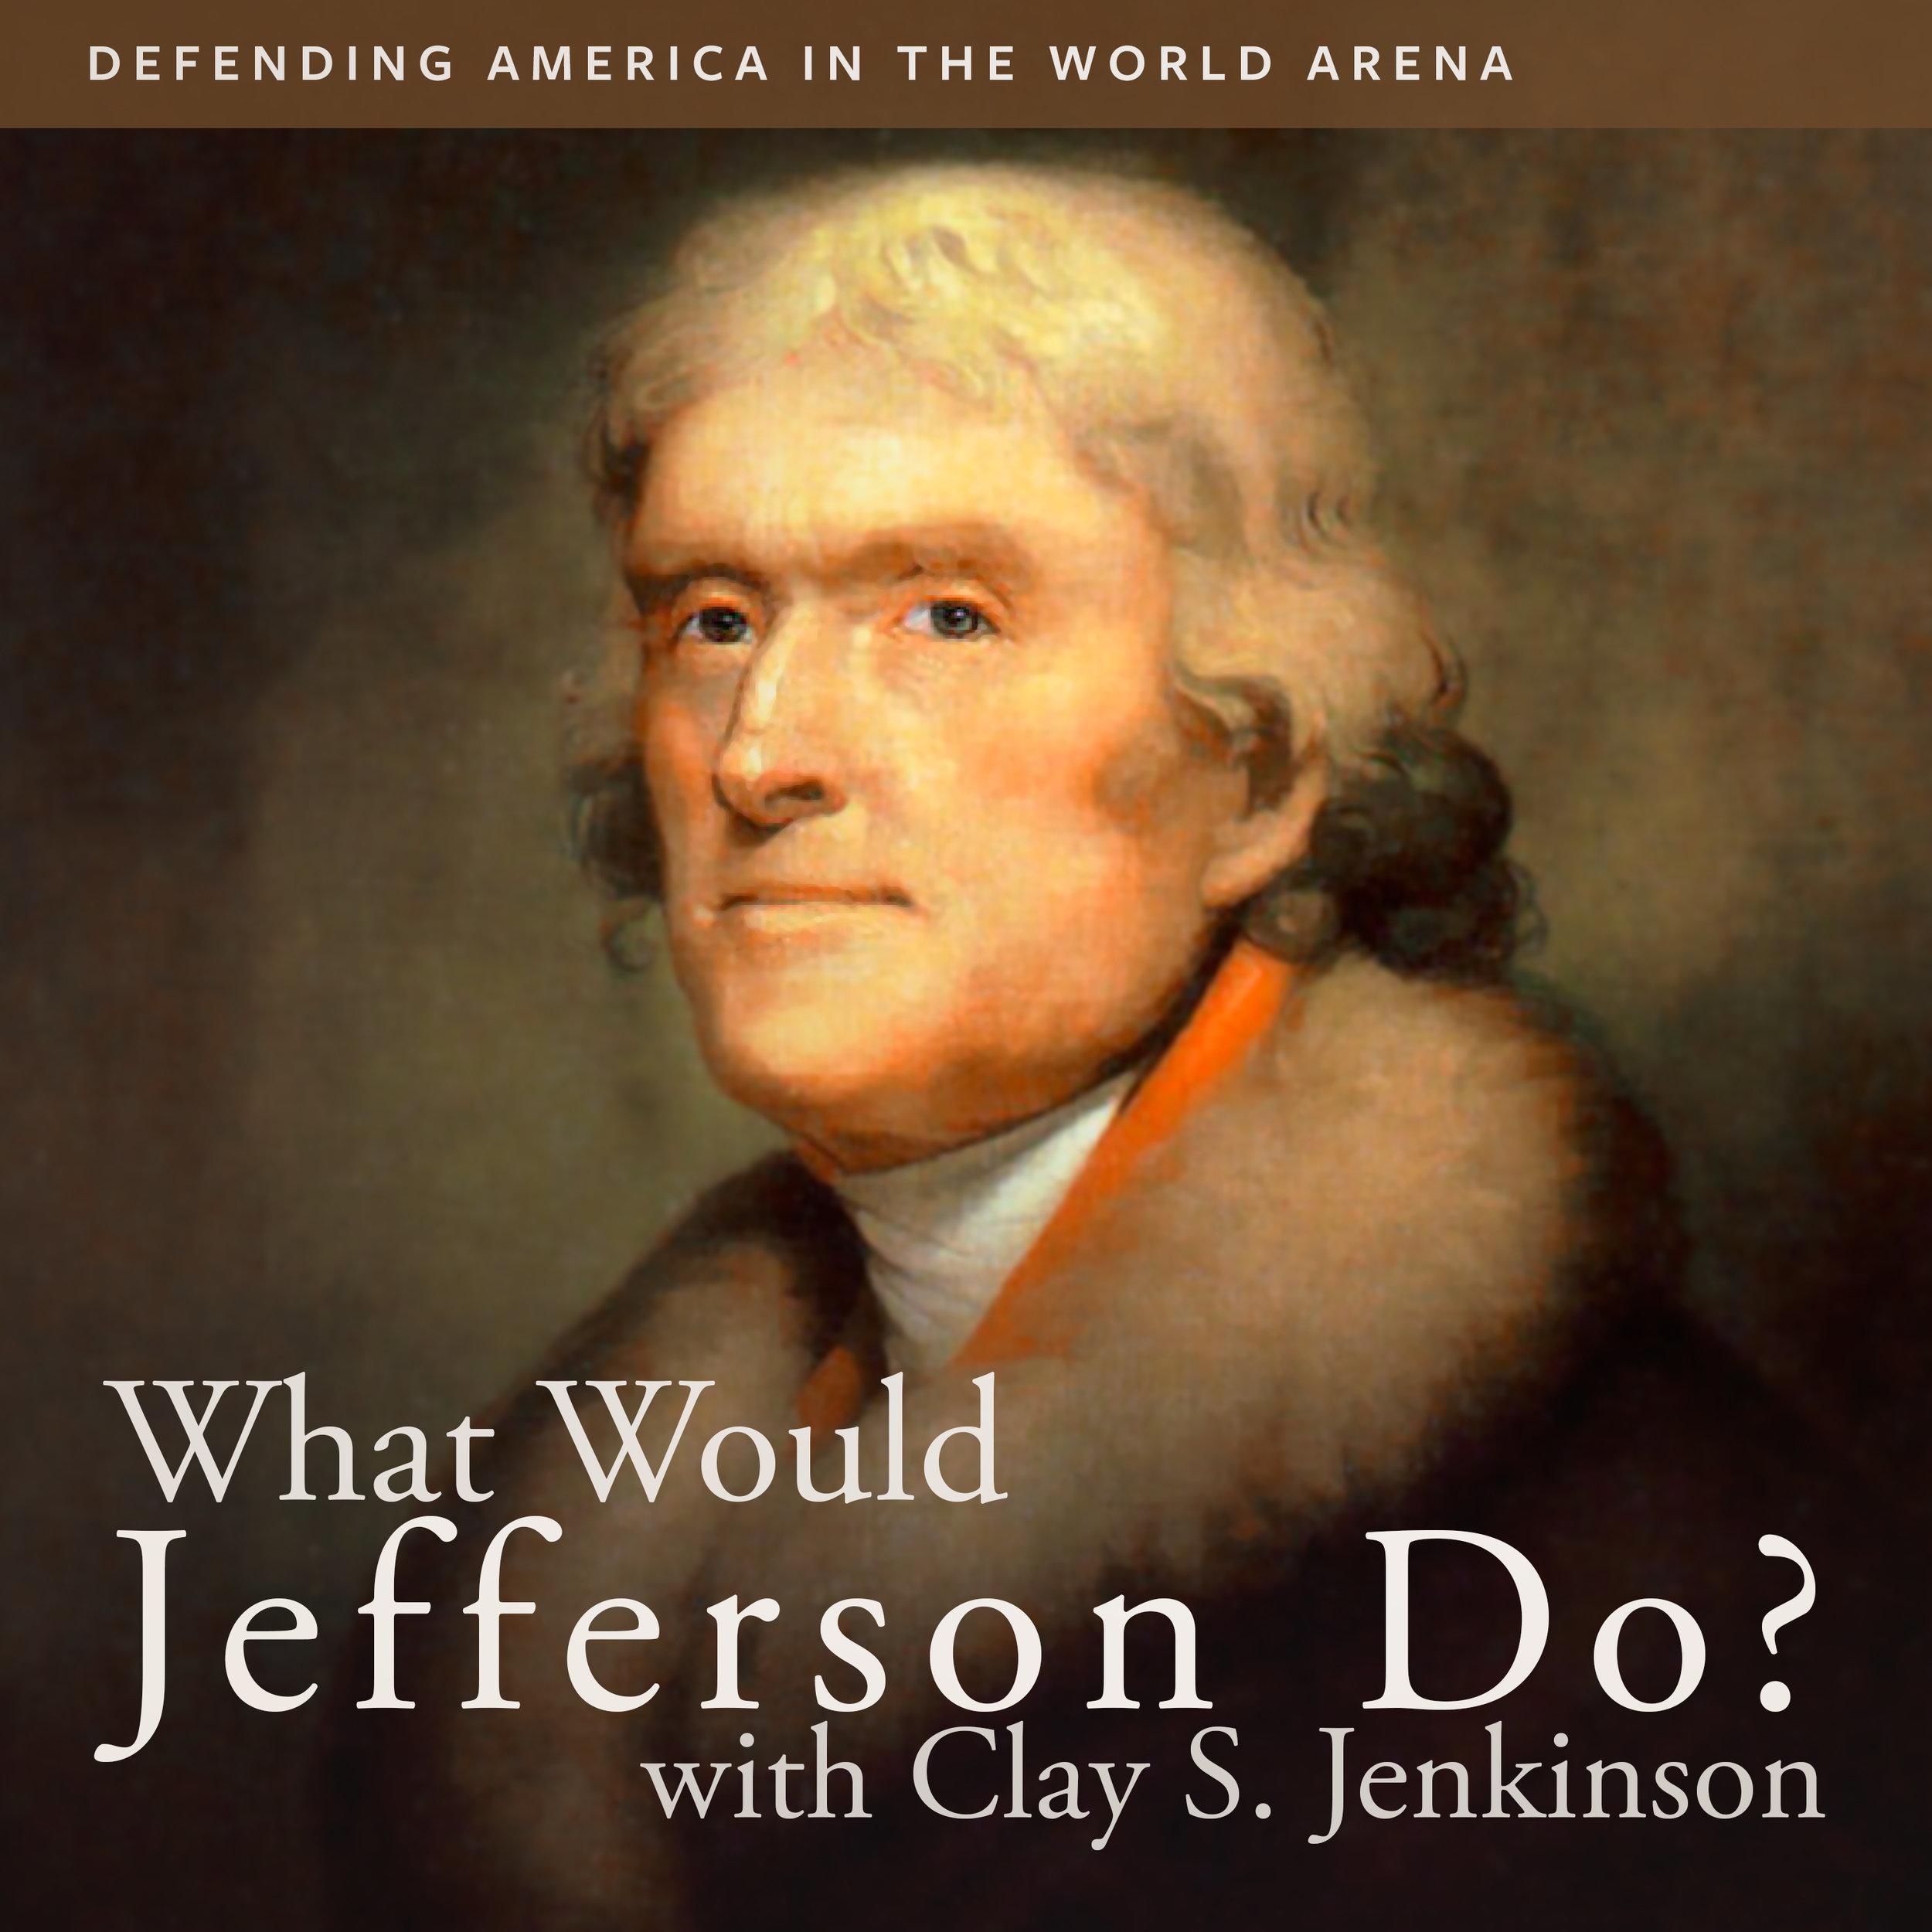 WWTJD_1296 Defending America in the World Arena.jpg